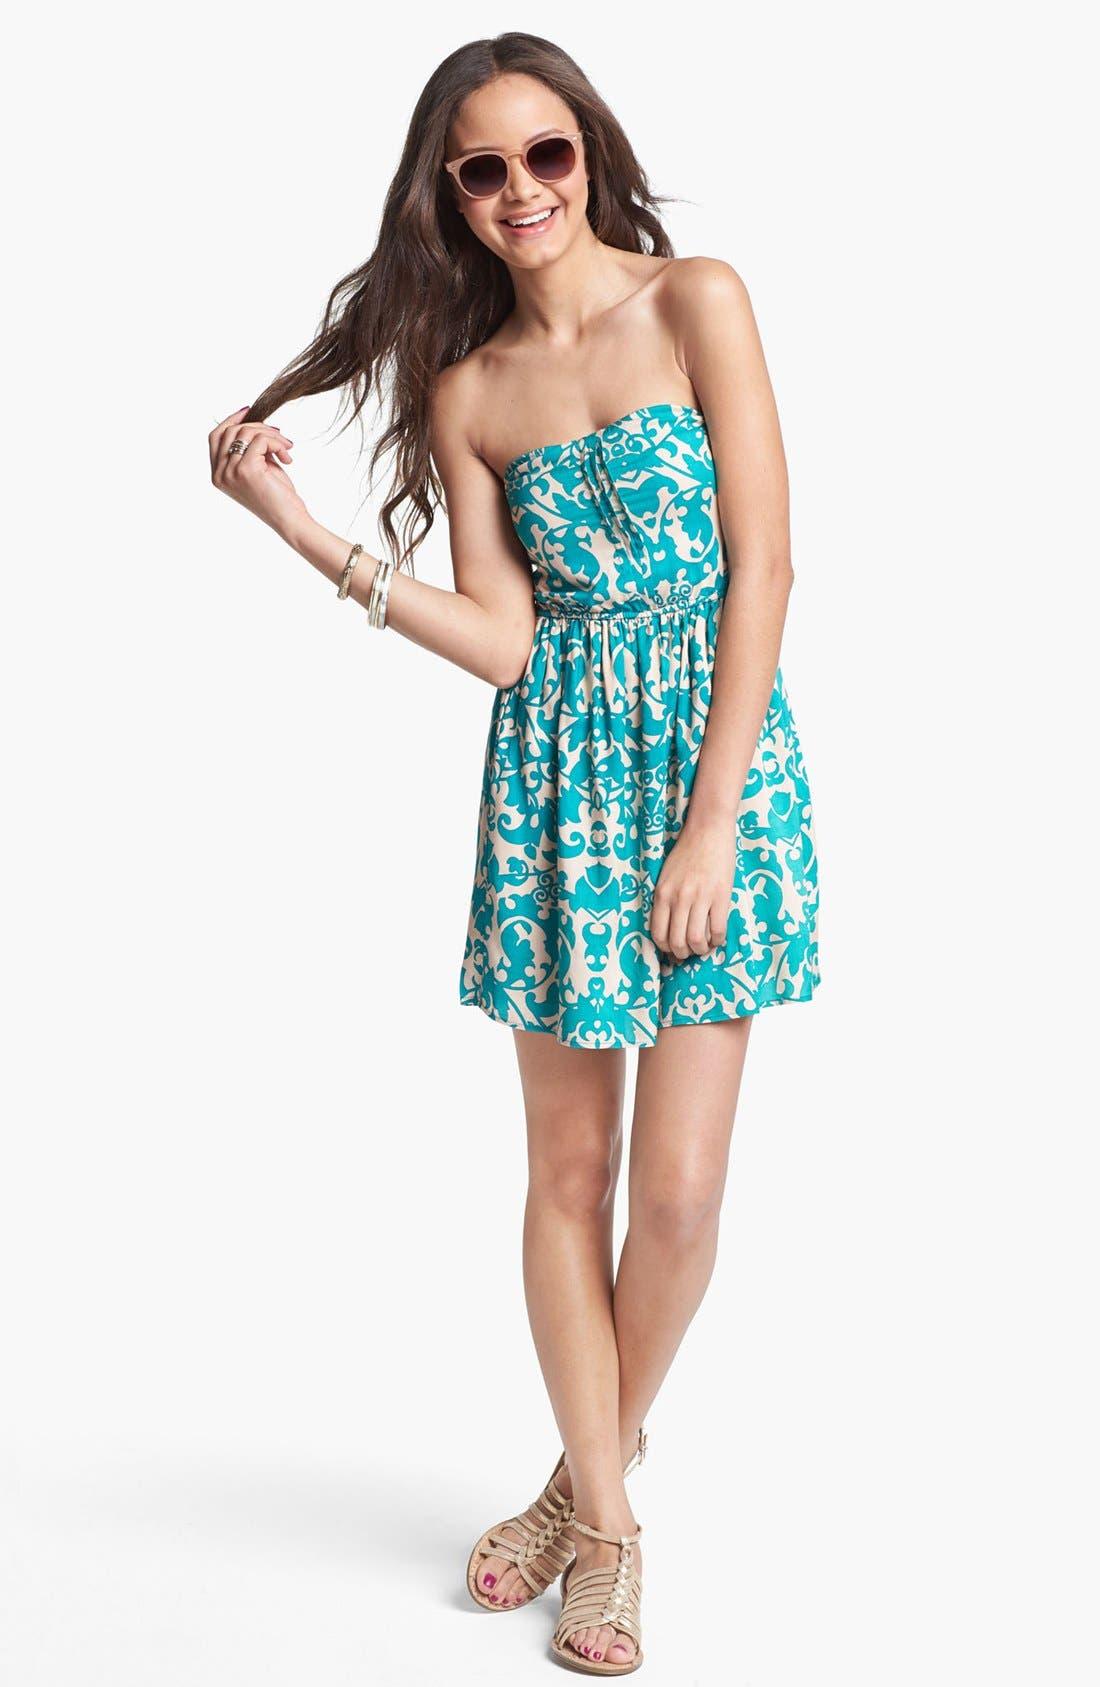 Alternate Image 1 Selected - dee elle 'Sweetheart' Strapless Dress (Juniors) (Online Only)